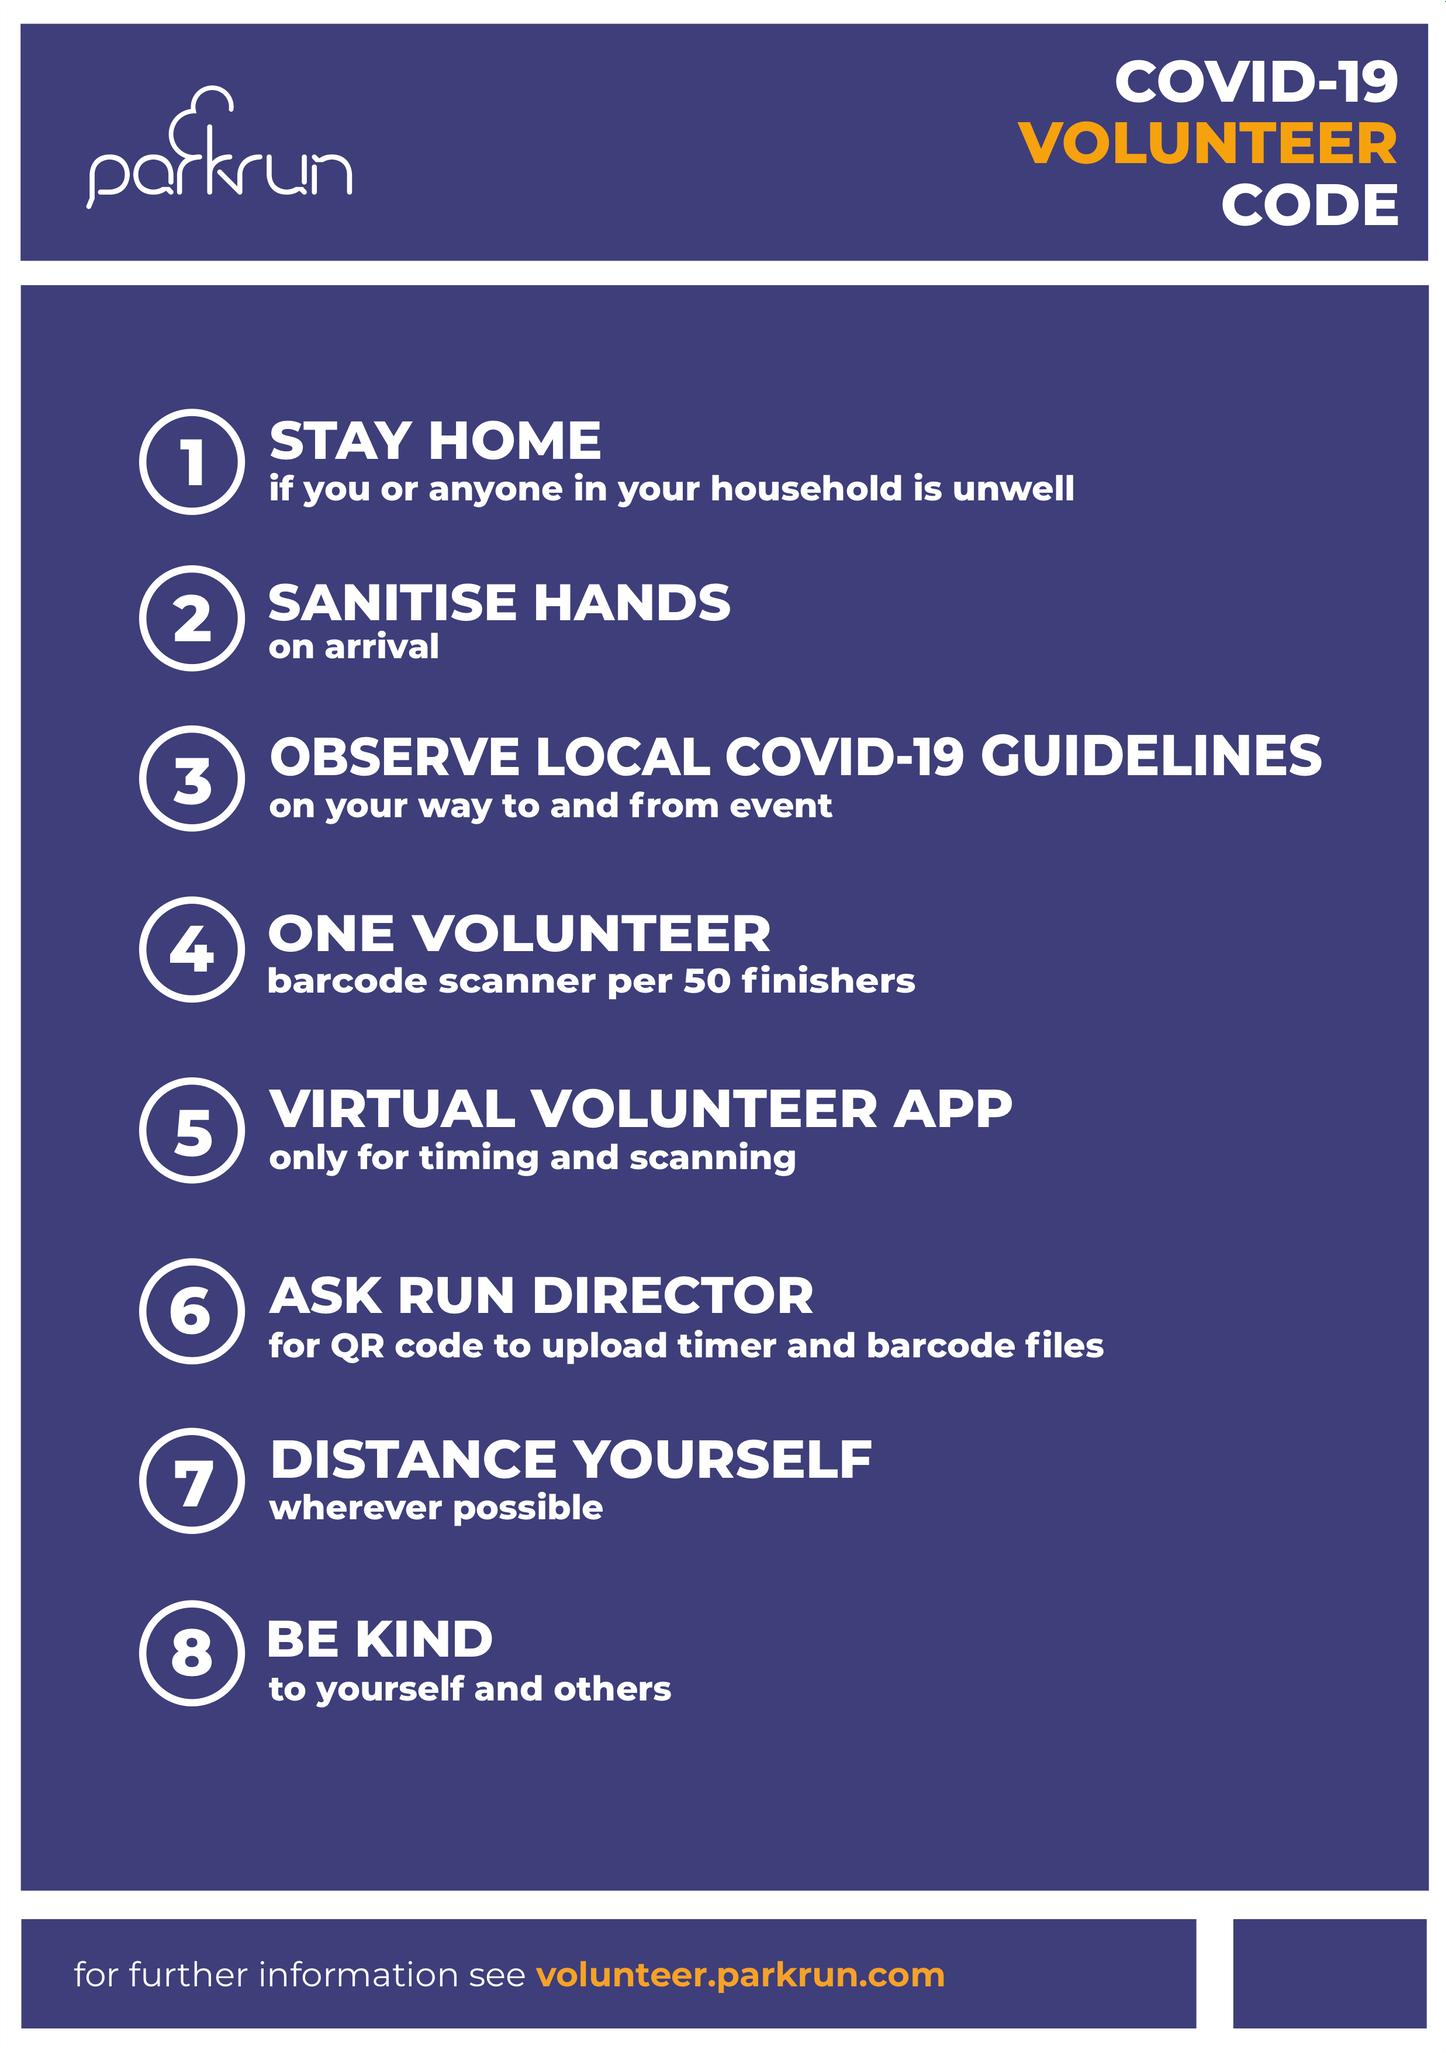 COVID19-parkrun-Volunteer Code